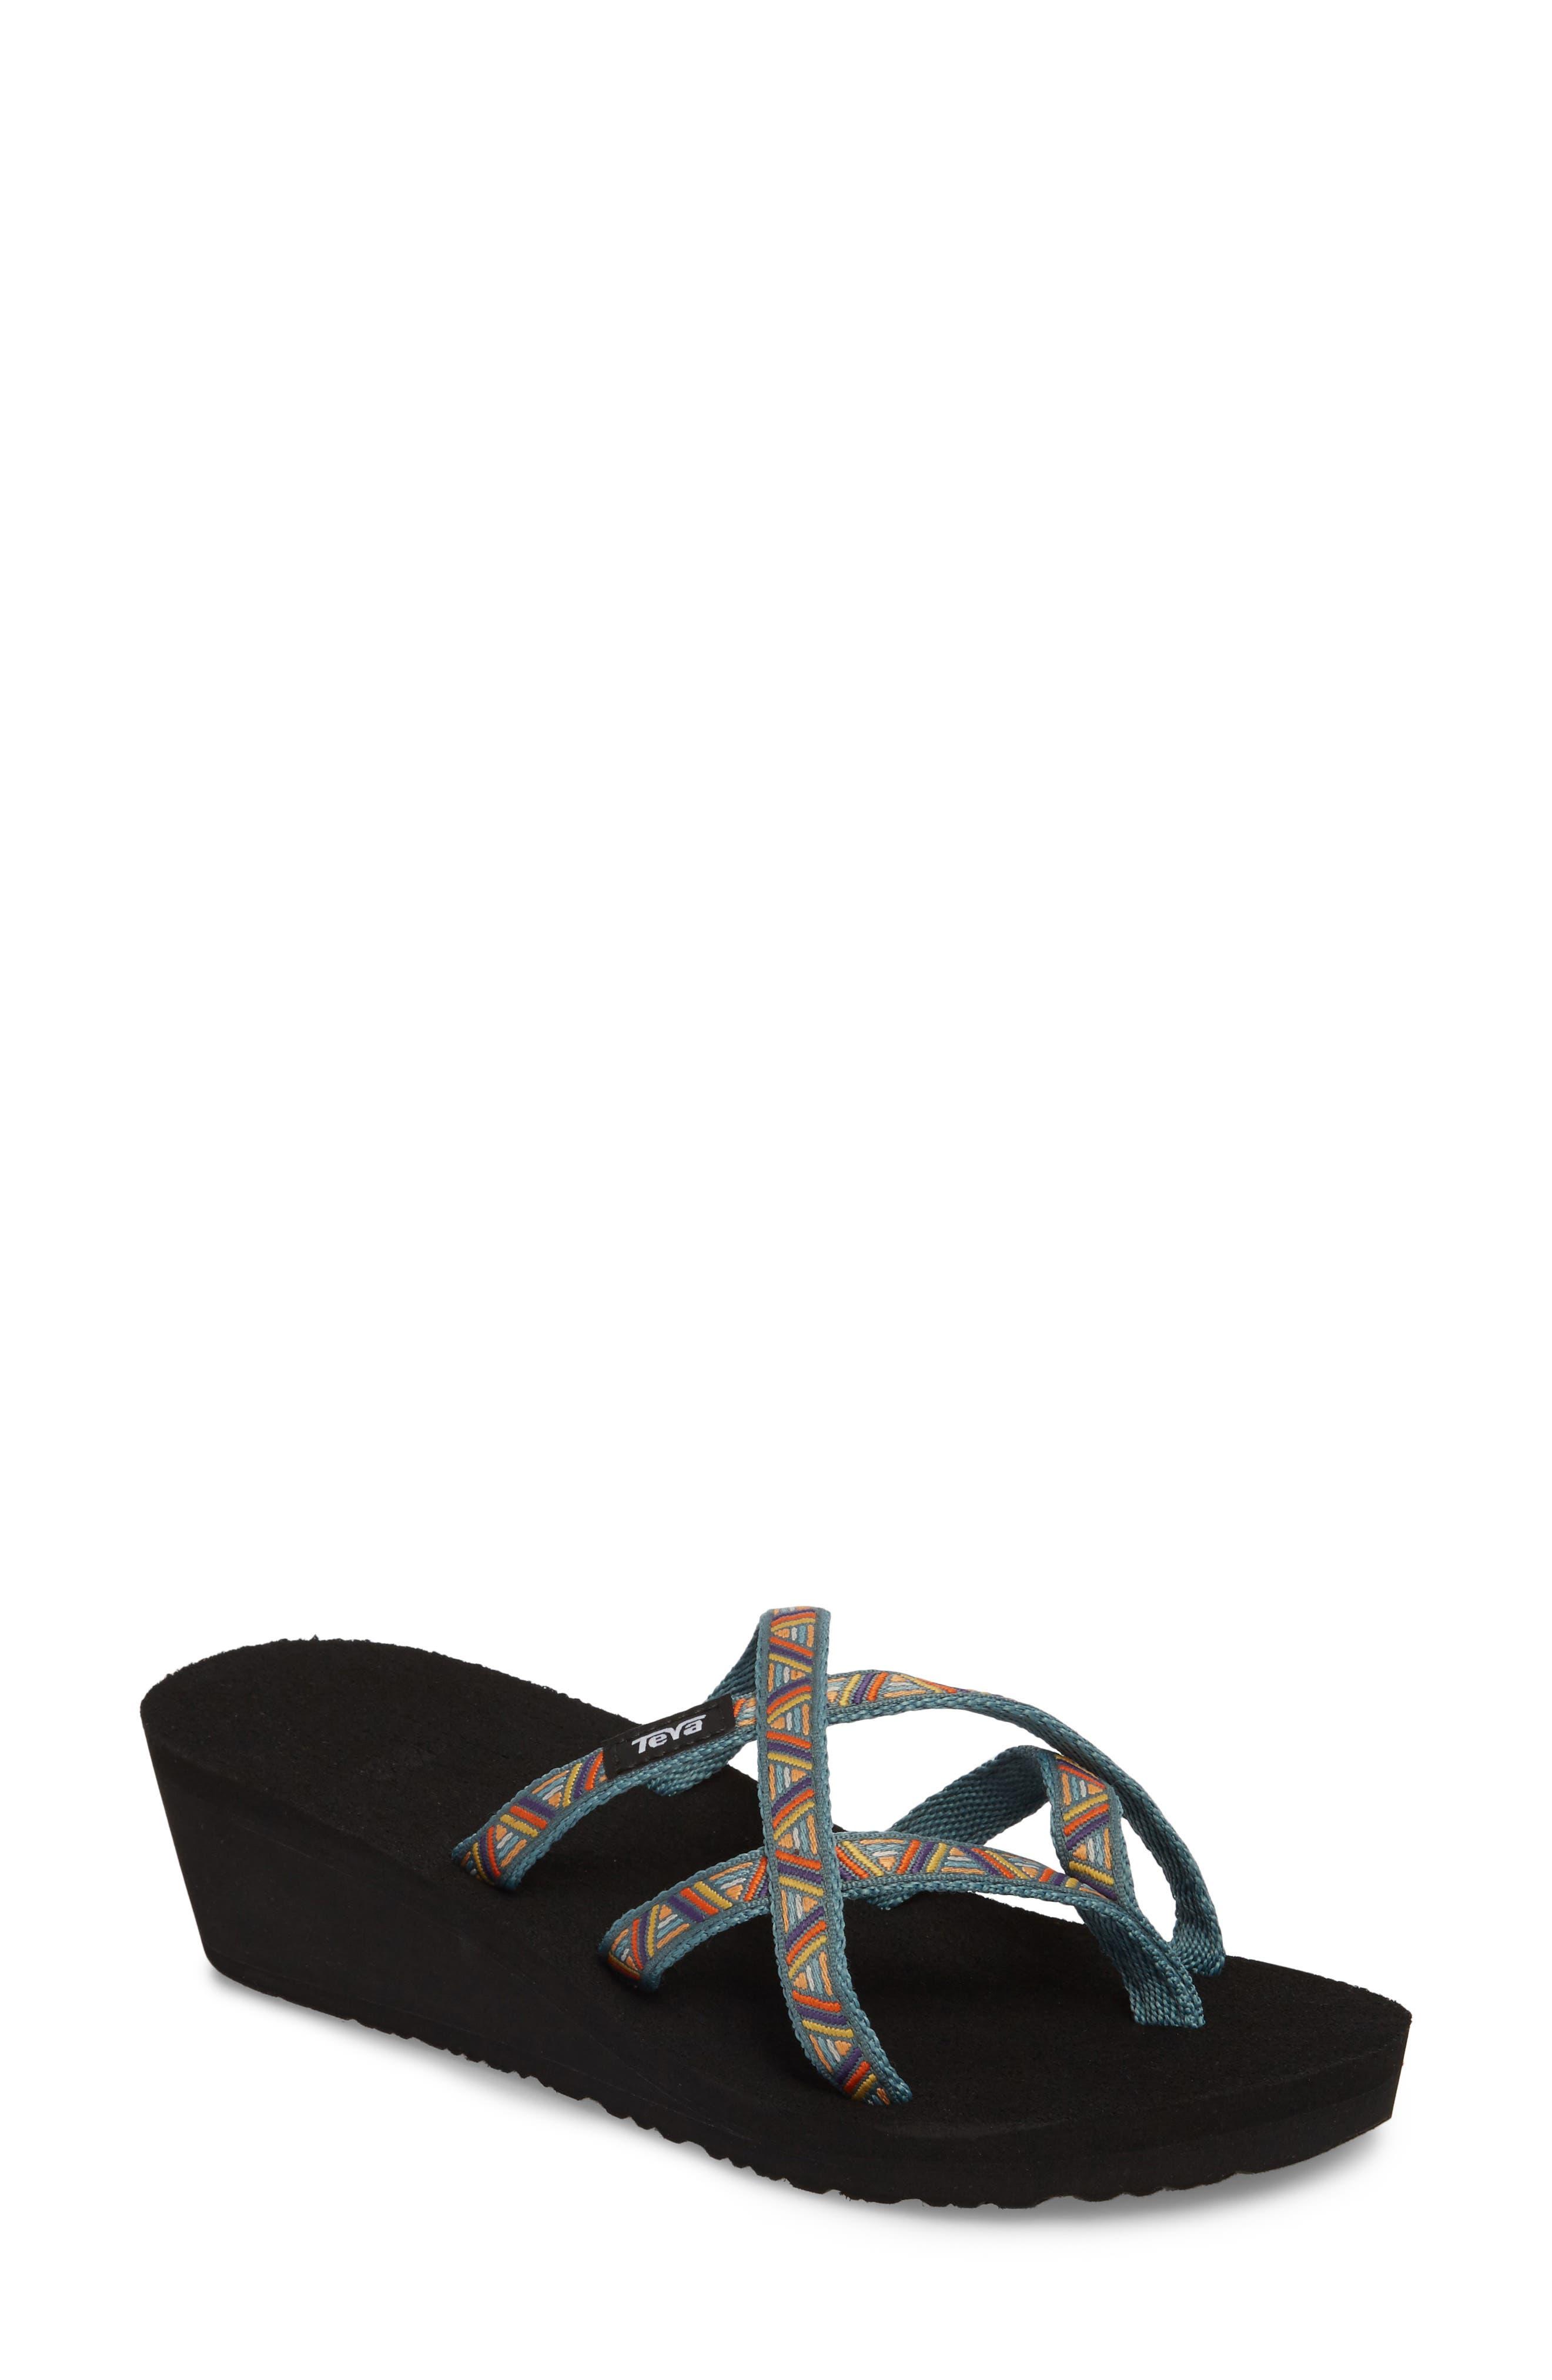 'Mandalyn' Wedge Sandal,                             Main thumbnail 1, color,                             930